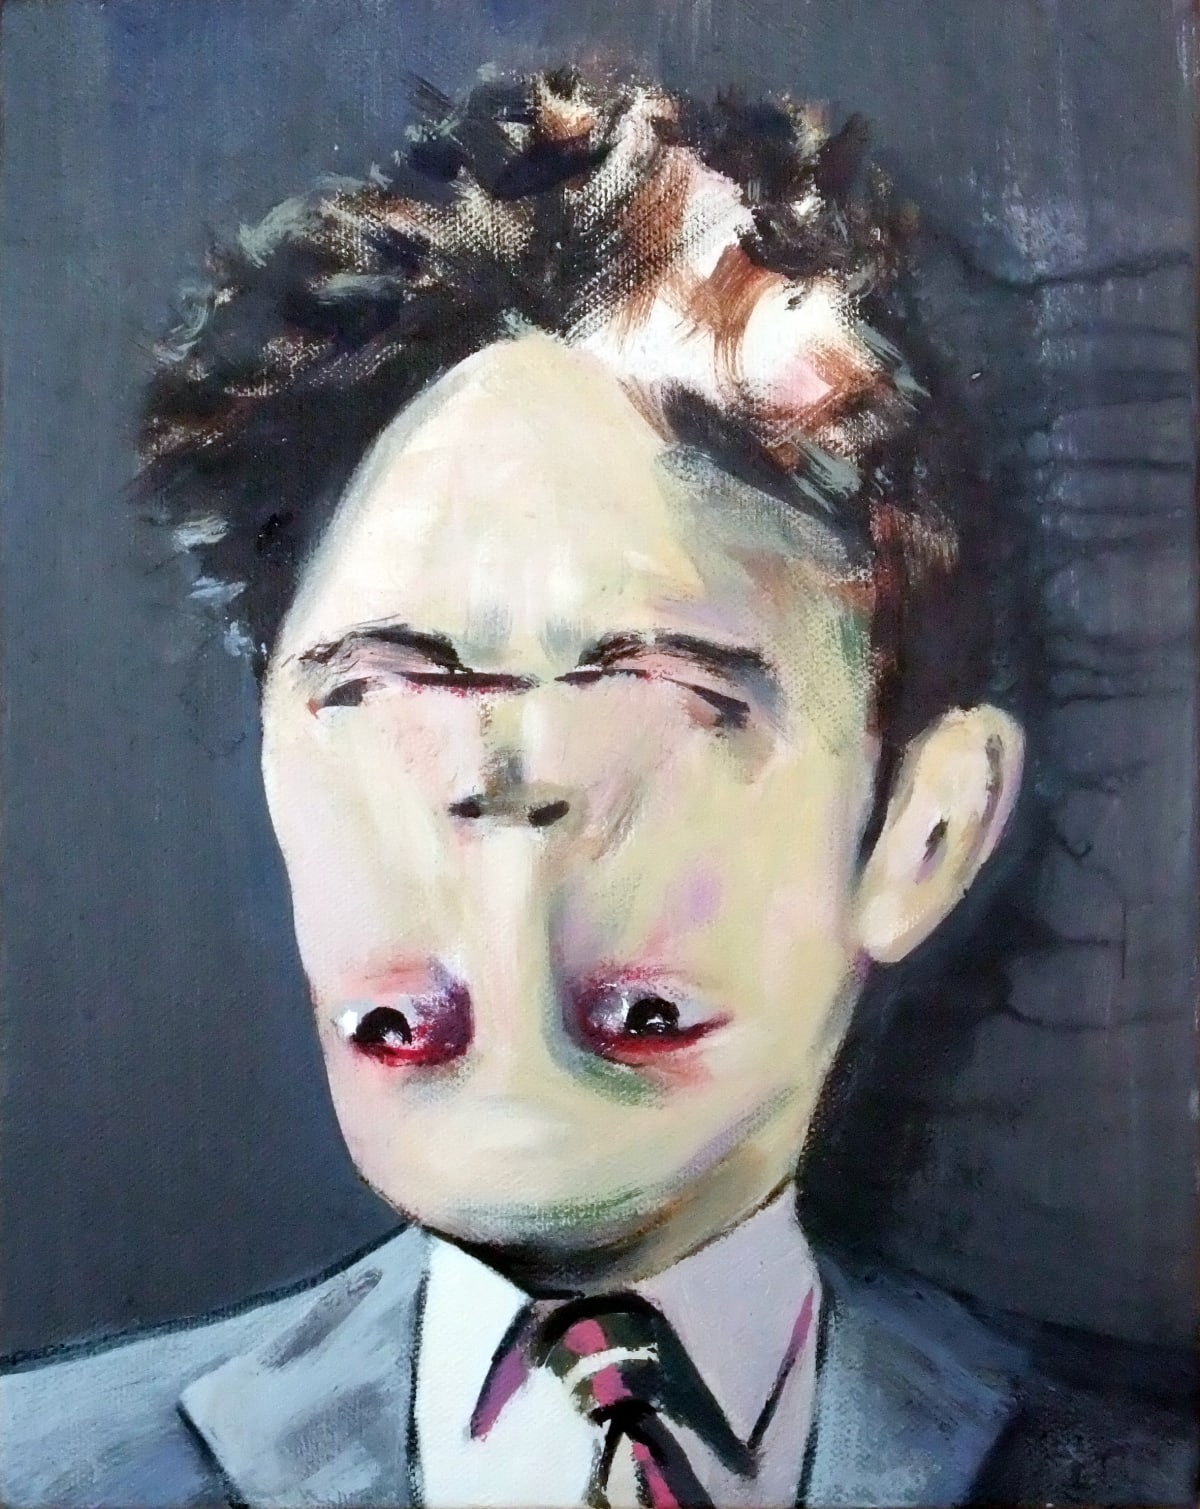 Darren Coffield Cocteau, 2009 Acrylic on canvas 41 x 36 cm 16 1/8 x 14 1/8 in